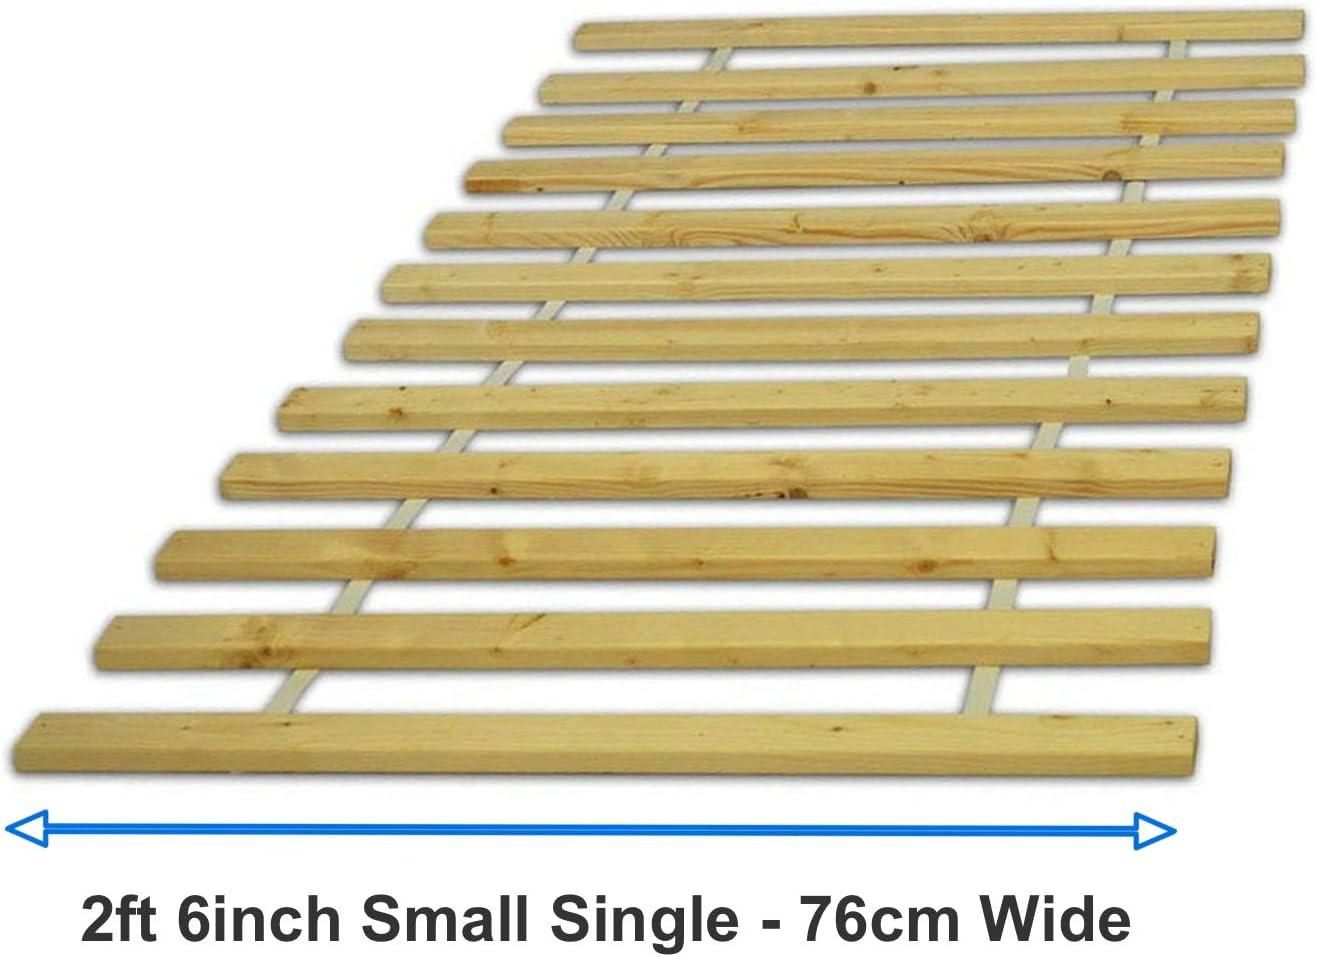 BMF DIRECT Somier de láminas de madera de repuesto para colchón de base de madera de pino para cama individual, doble/super king (1,5 m kingsize)